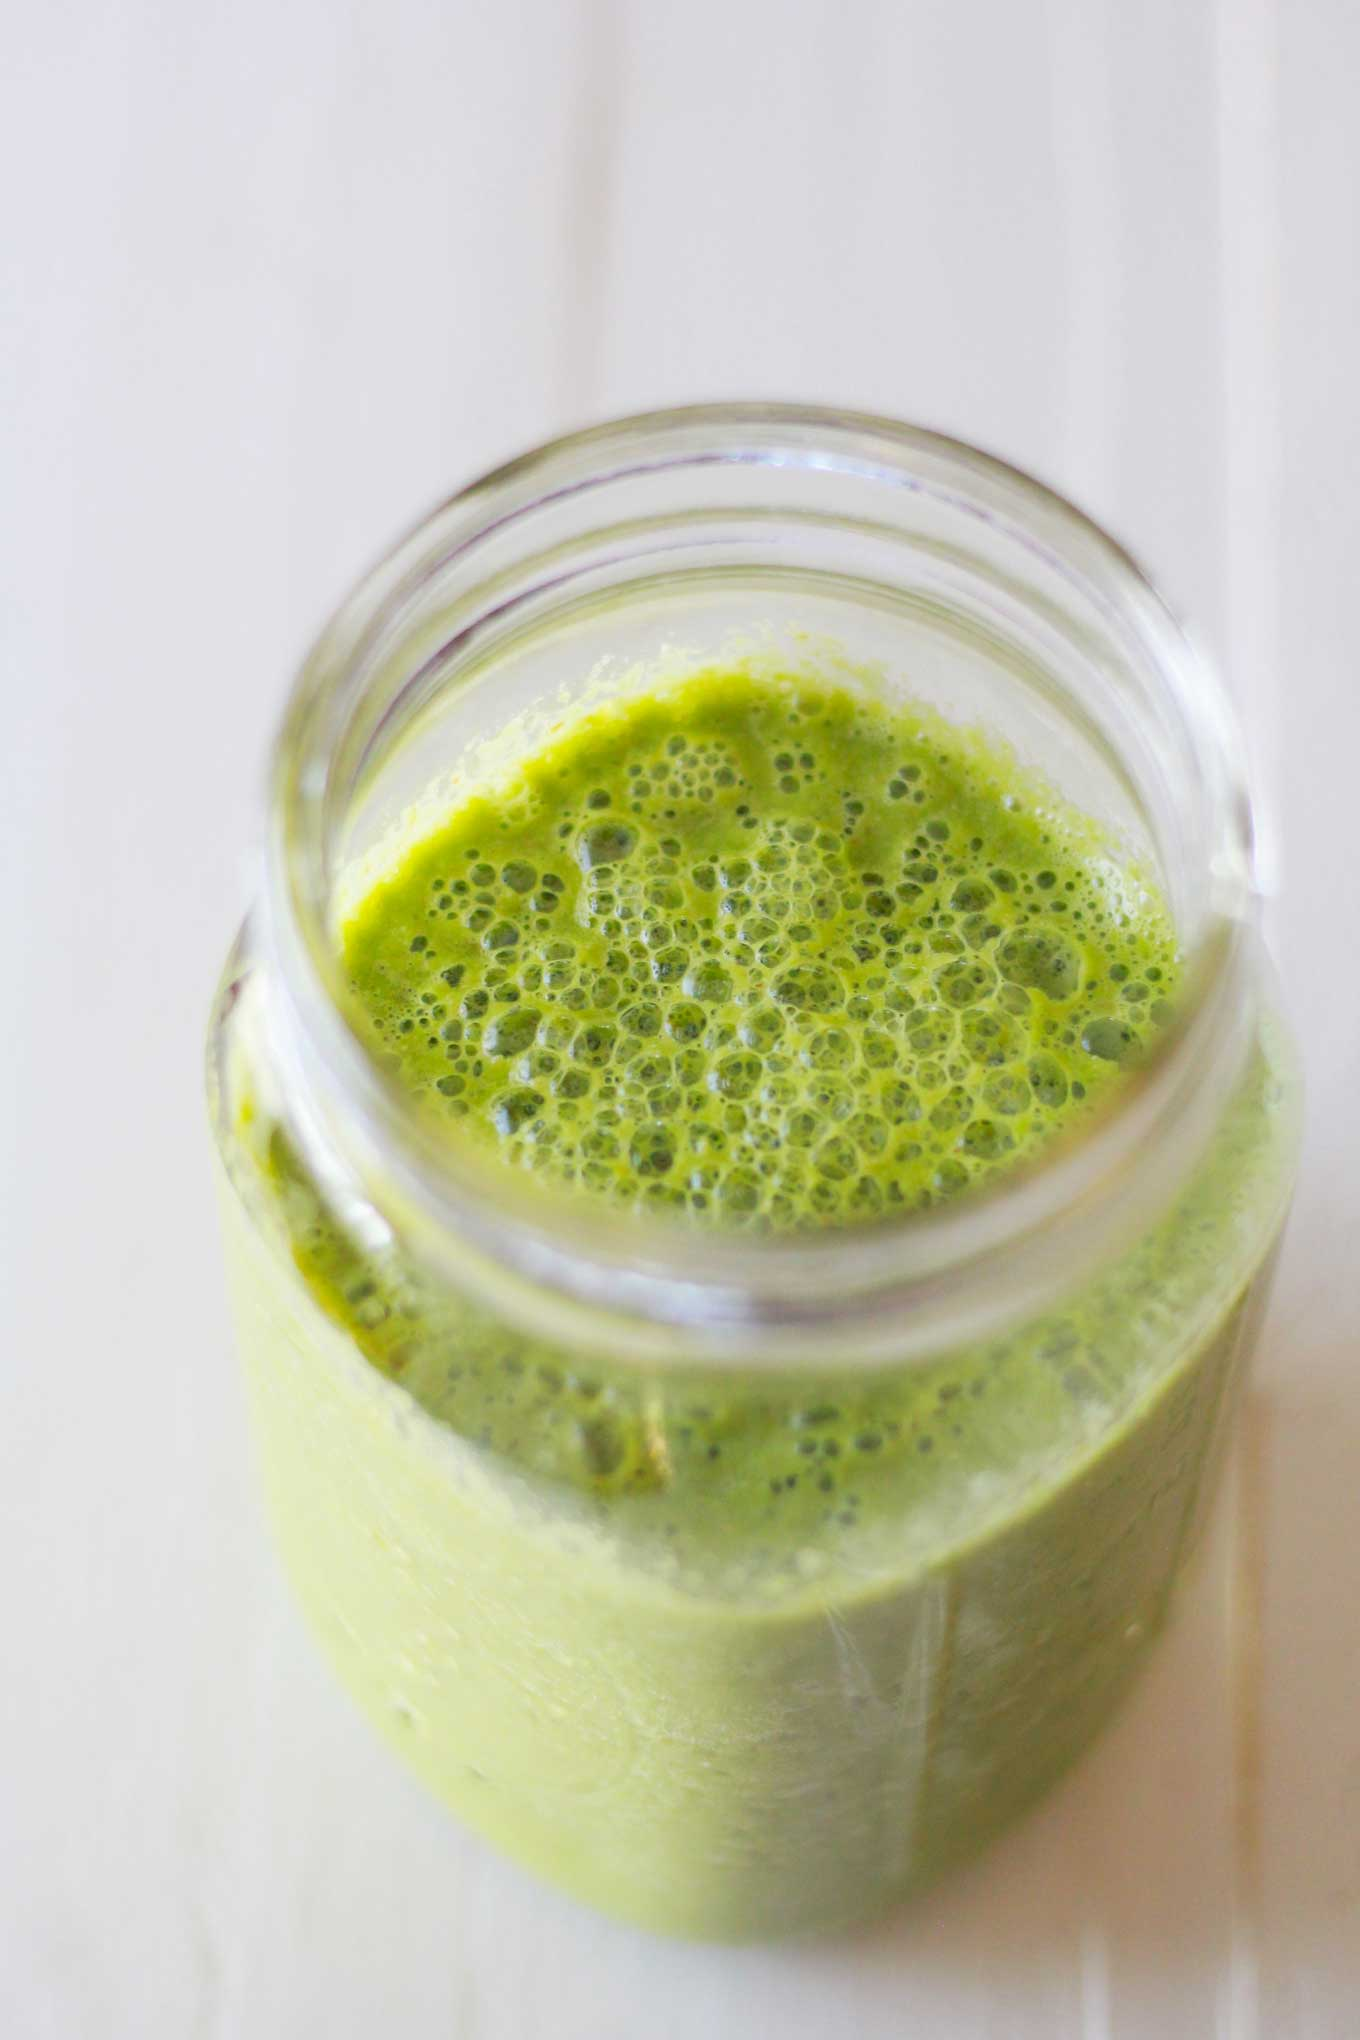 Perfect Green Smoothie | Green smoothie in mason jar | Vegan green smoothie recipe | https://passtheplants.com/